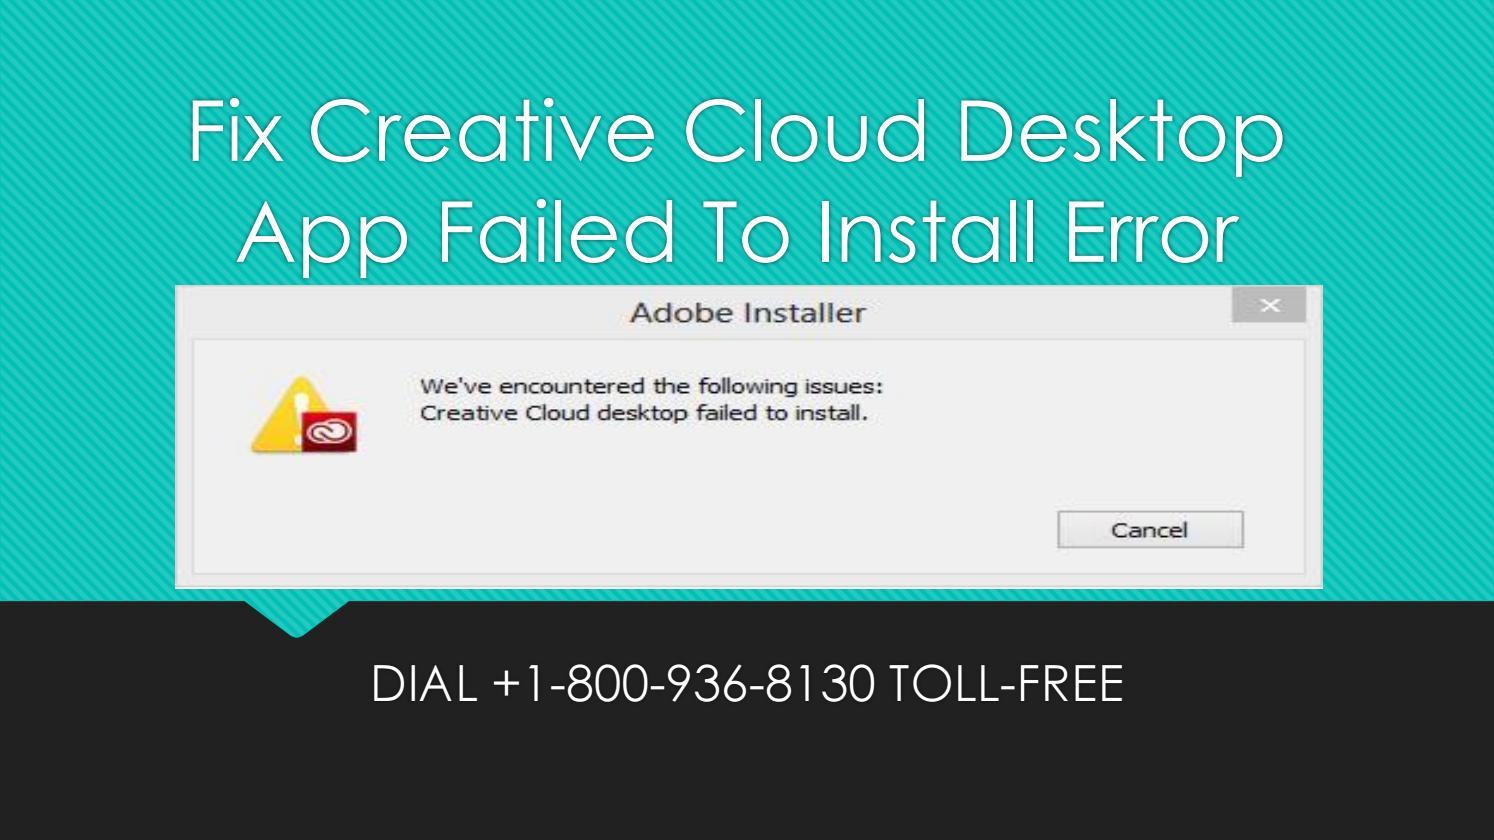 Fix creative cloud desktop app failed to install error by